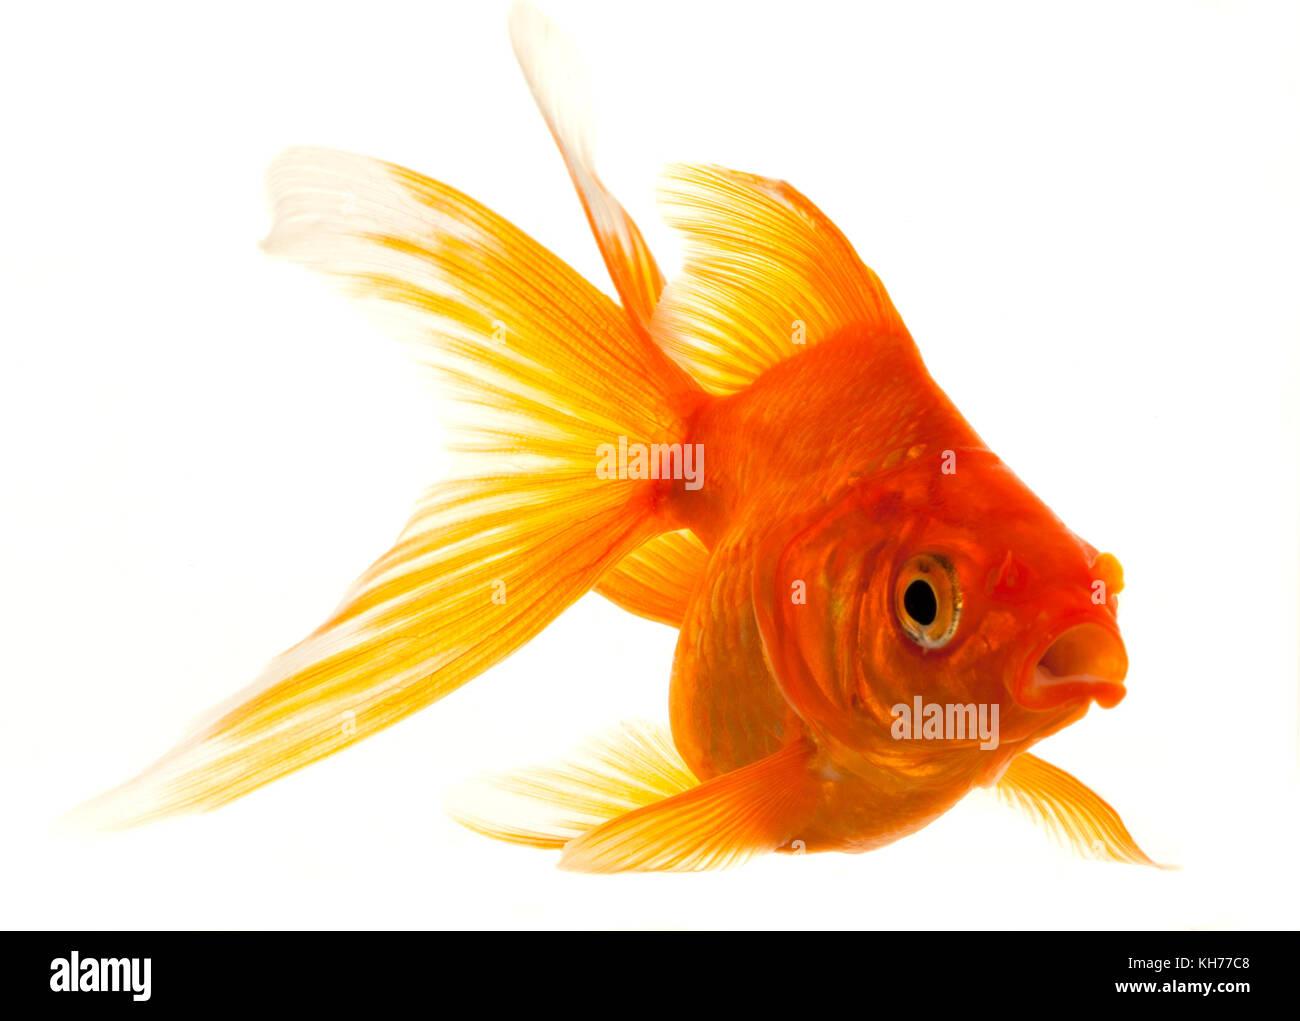 Isolated Approaching Goldfish swimming towards camera, close-up on white Stock Photo